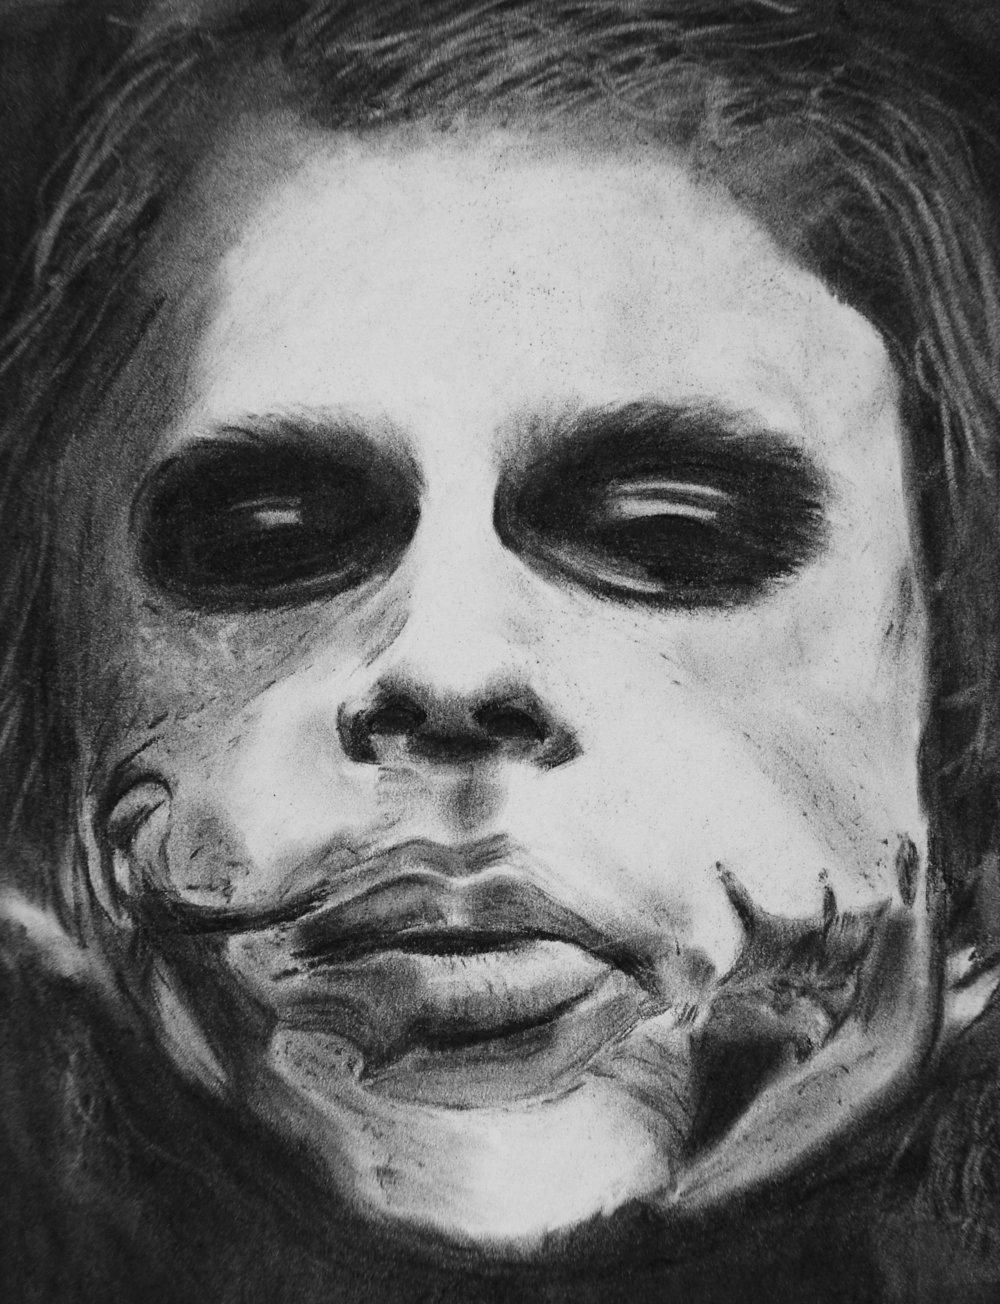 Joker, charcoal